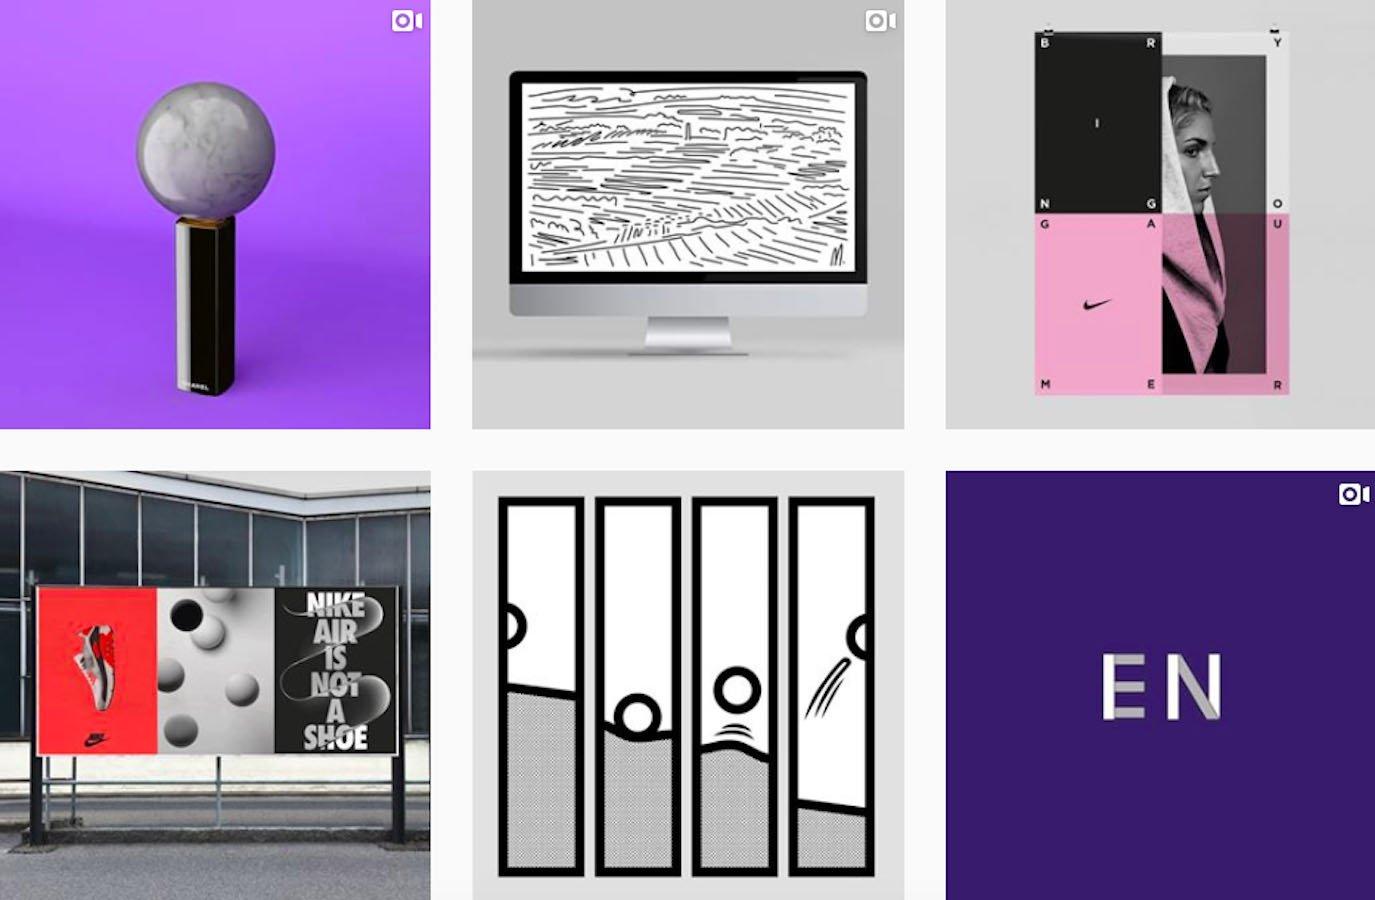 Web Design Inspiration: 110+ Accounts On Instagram and 10+ Best UX & Web Design Books in 2020 - studiofeixen